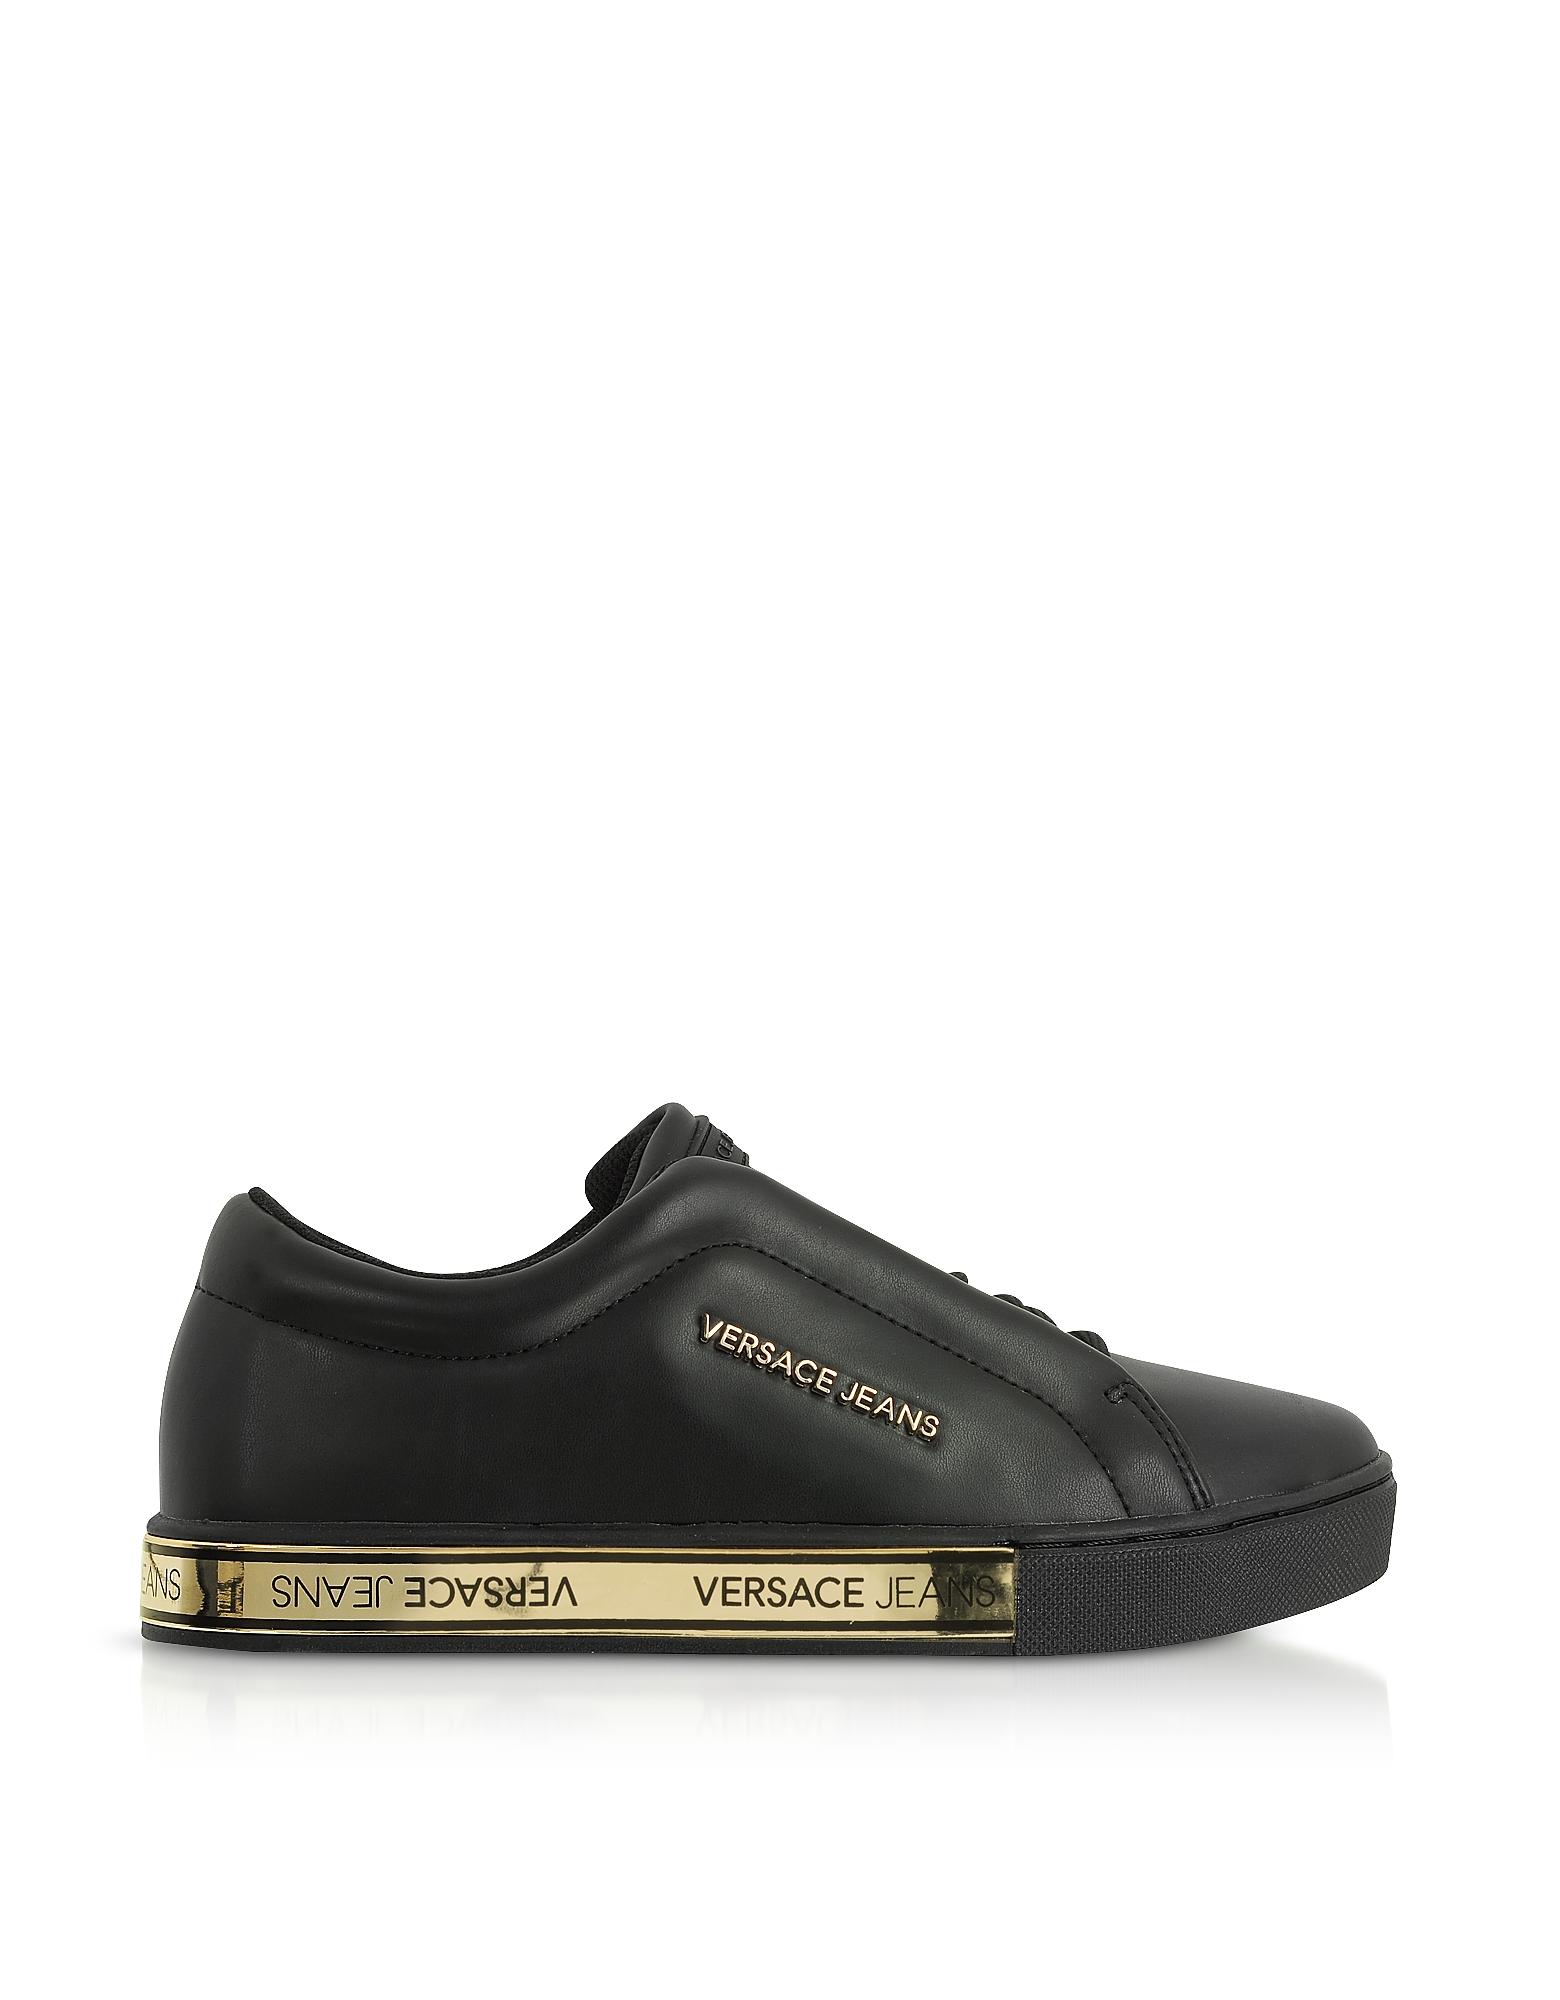 Versace Jeans Designer Shoes, Kim Black Flat Women's Sneakers